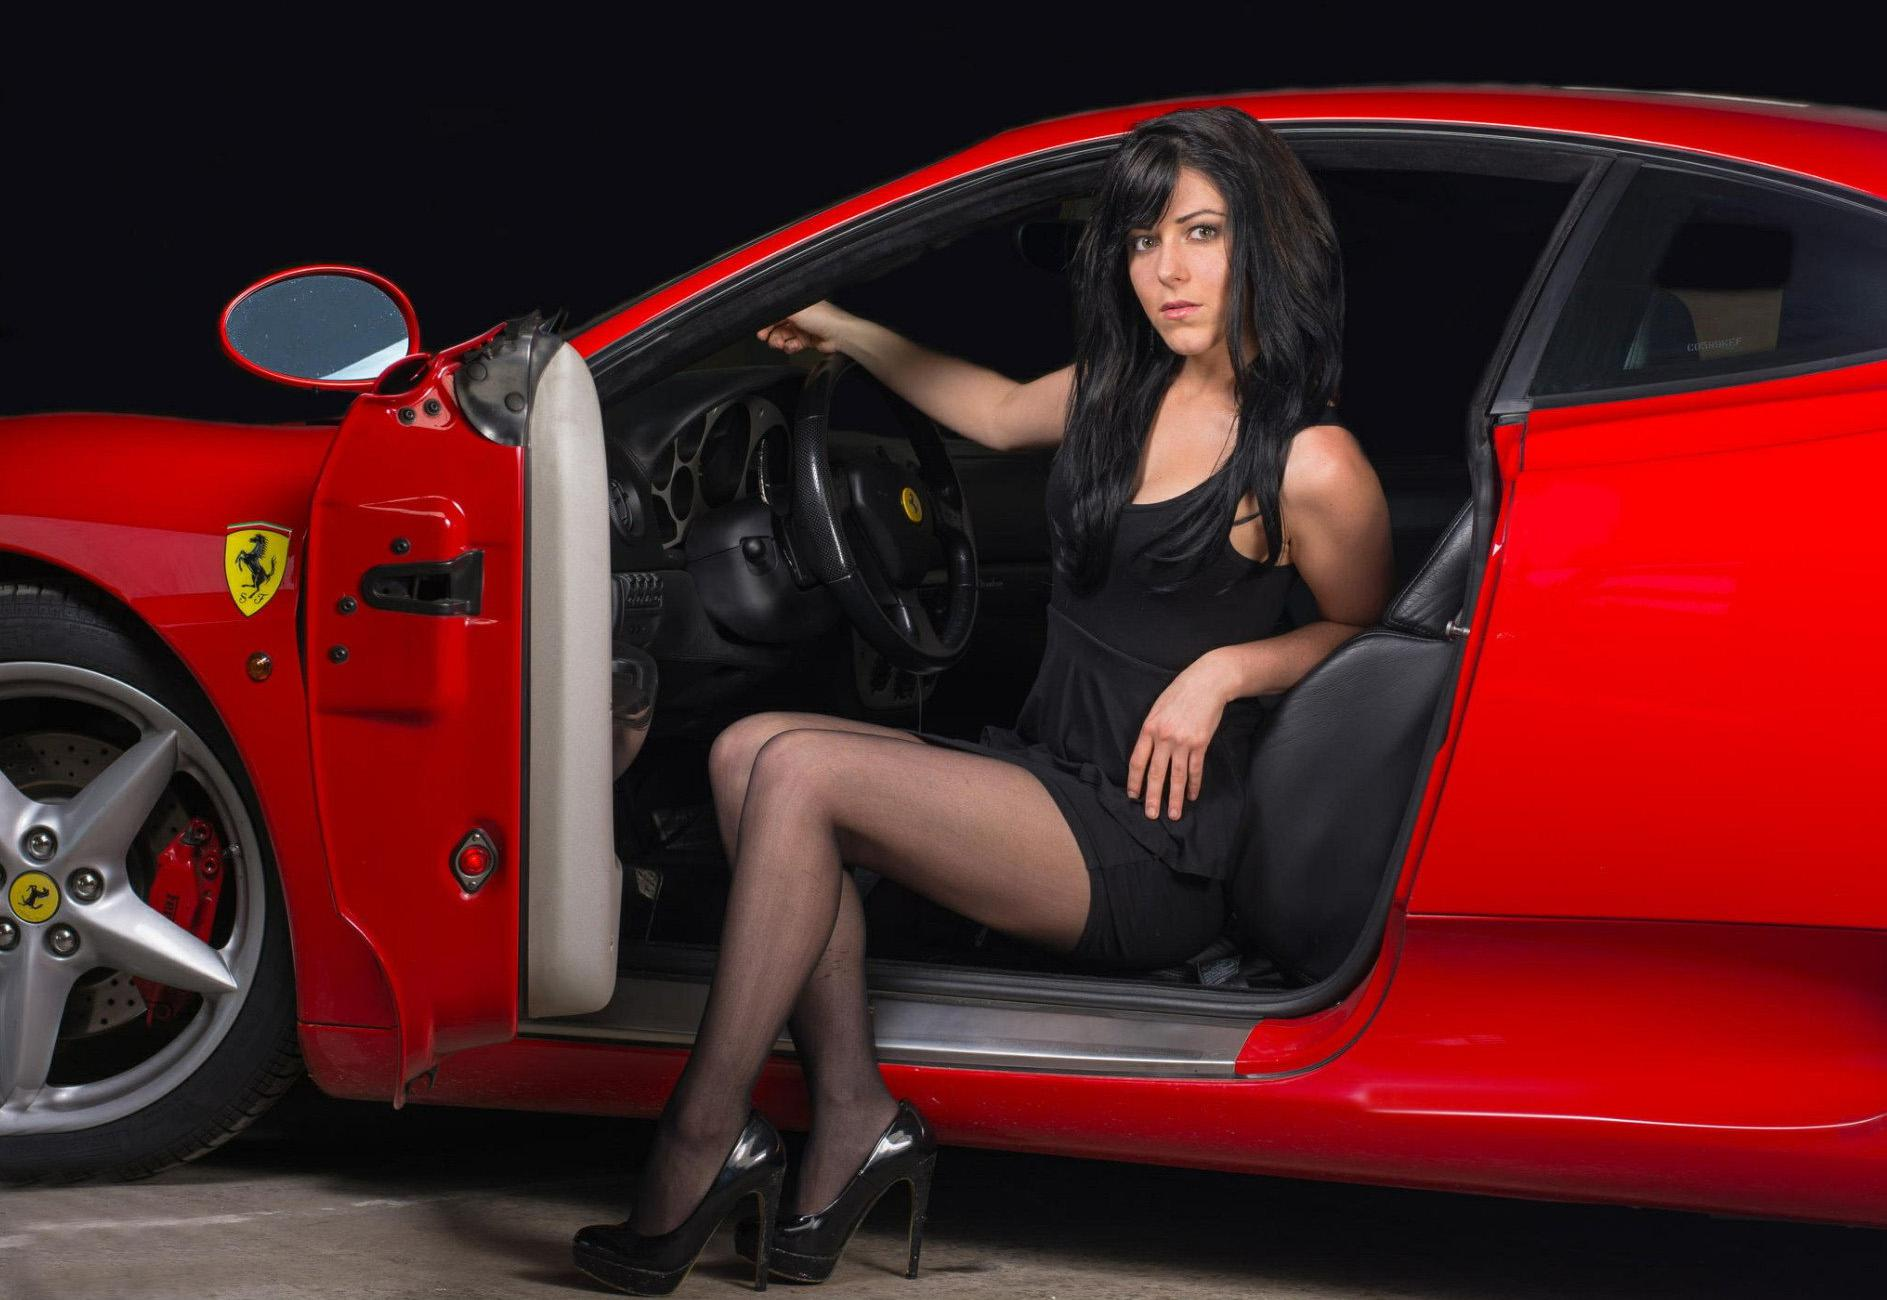 Секс видео автомобили, пизда раком фото подборка